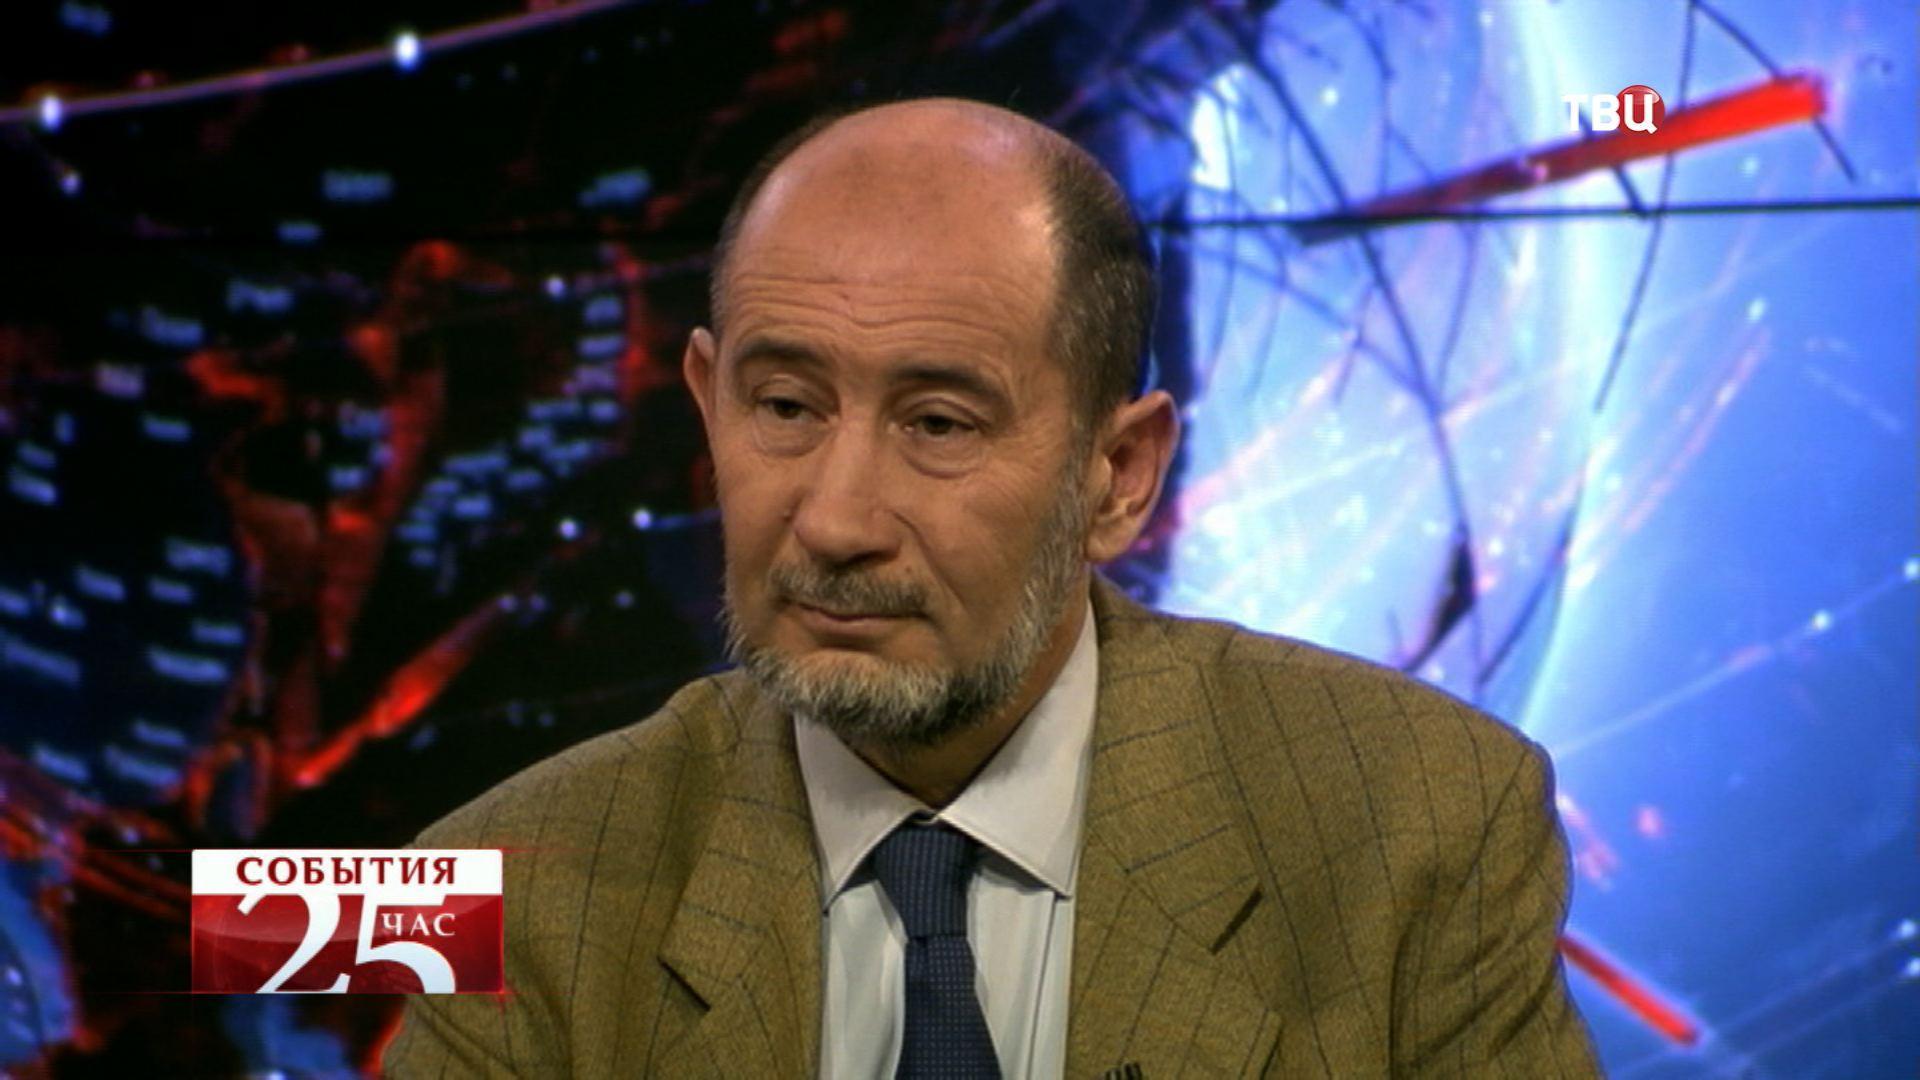 Александр Бузгалин - директор Института социоэкономики МФЮУ